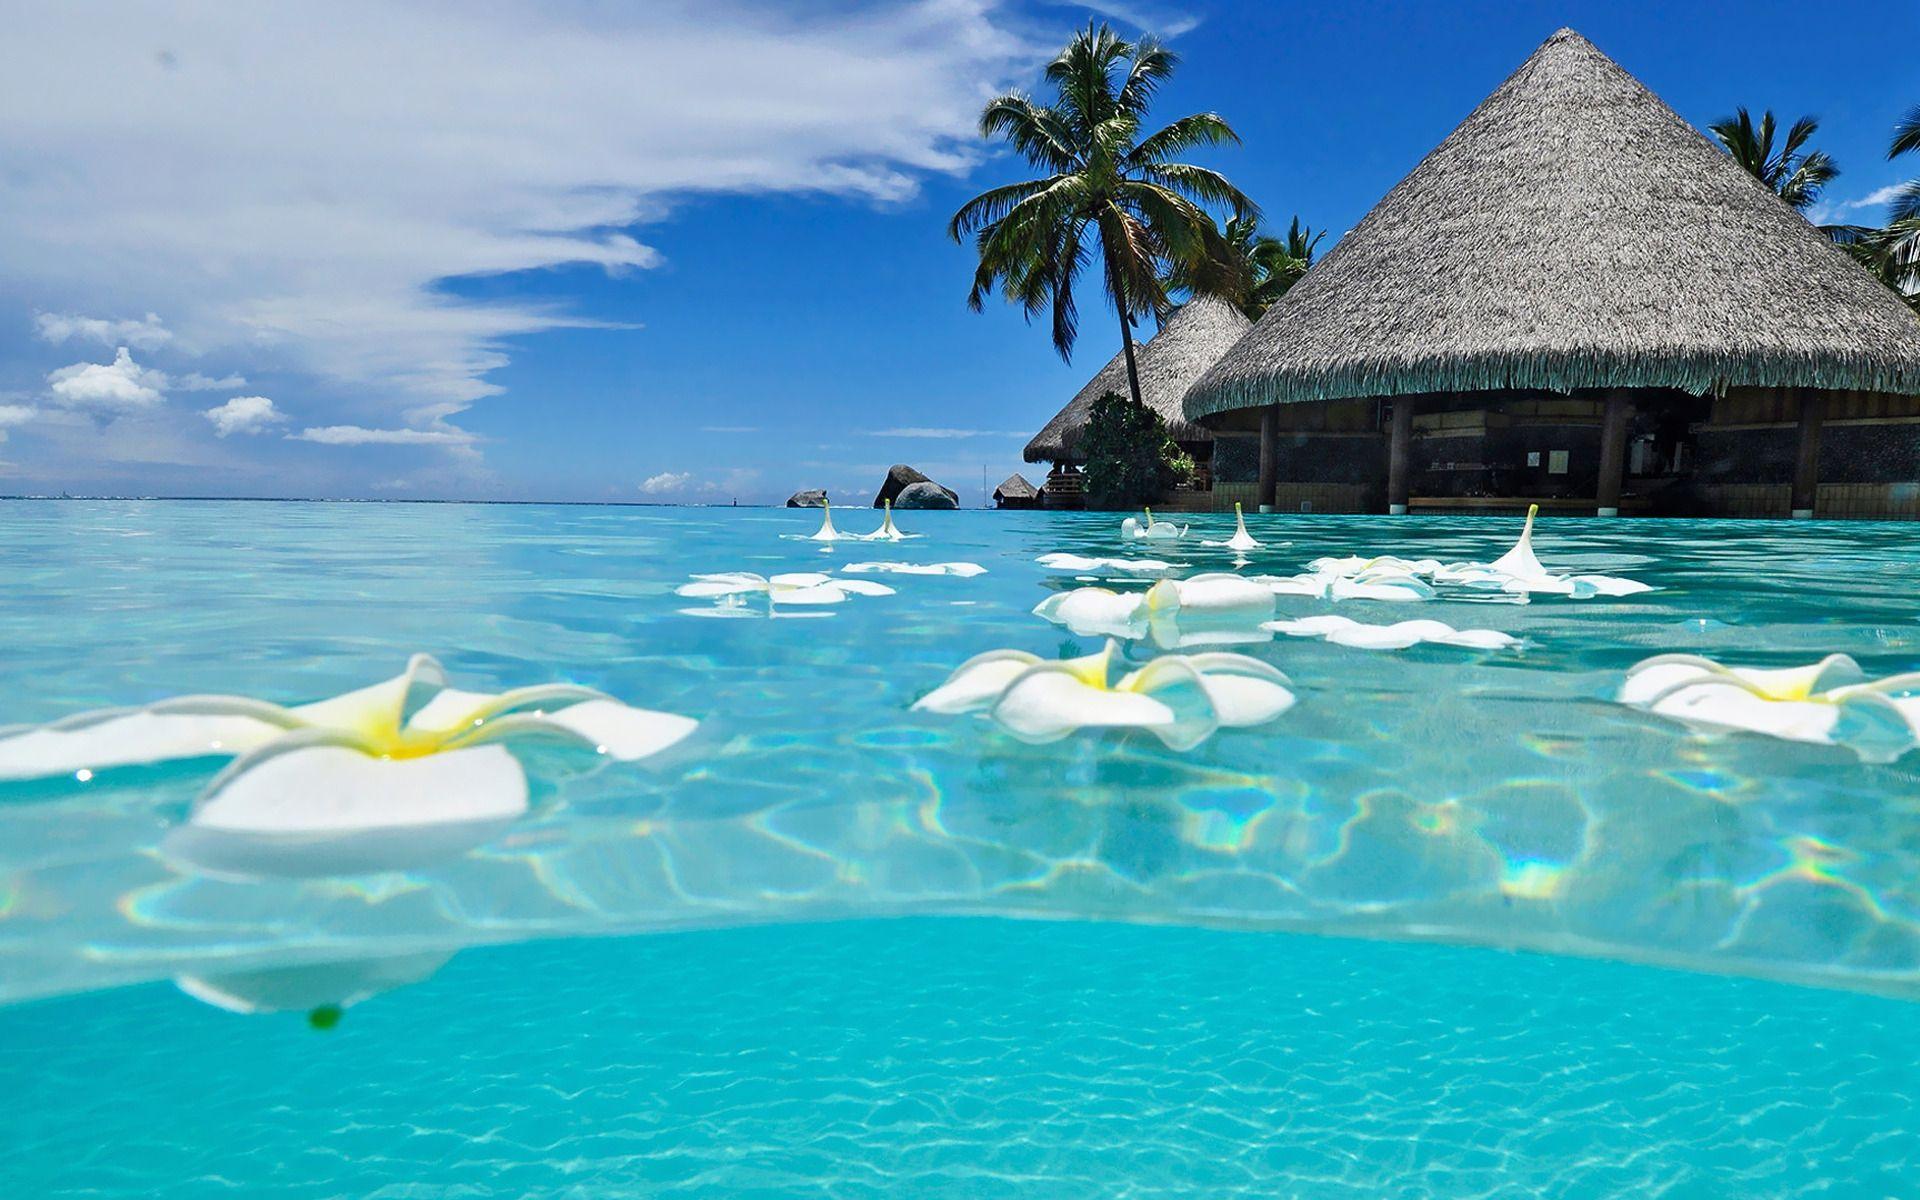 Pin By Kryz Lopez On Relaxation Cancun Beaches Beautiful Beaches Beach Wallpaper